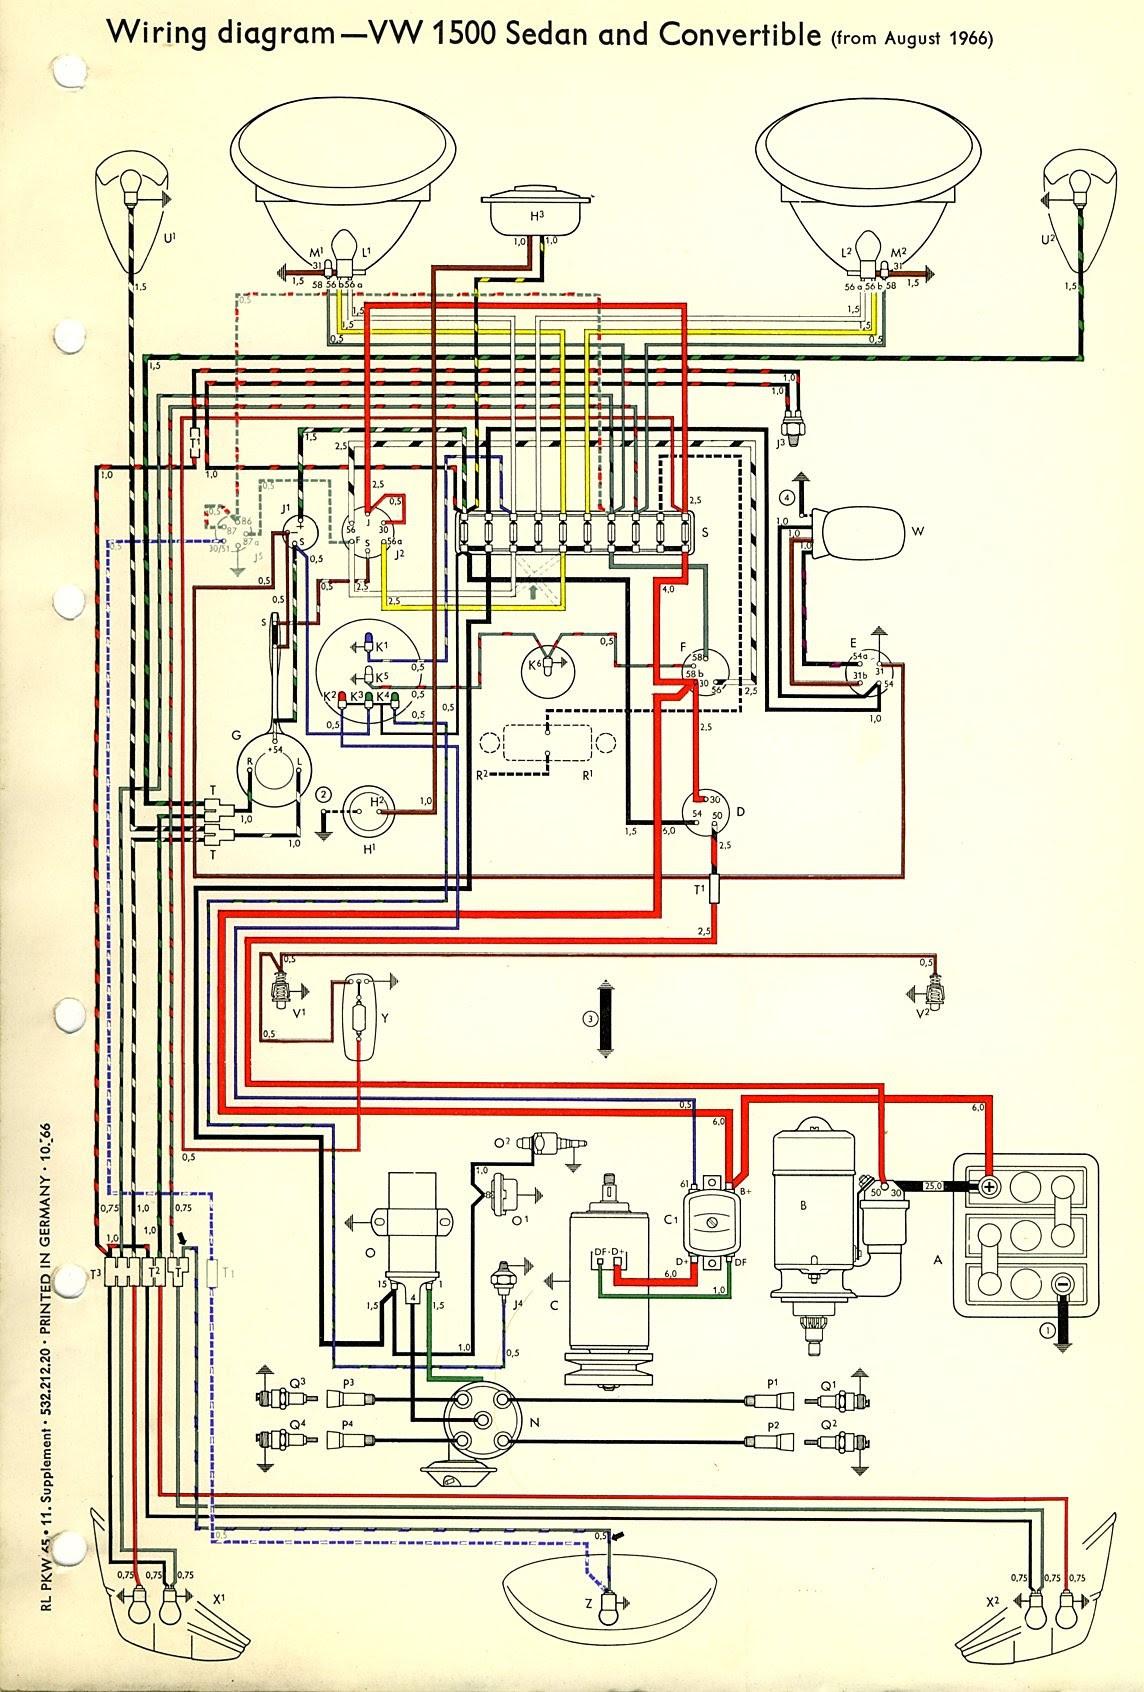 74 Vw Beetle Wiring Diagram Wiring Diagram Productive Productive Zaafran It